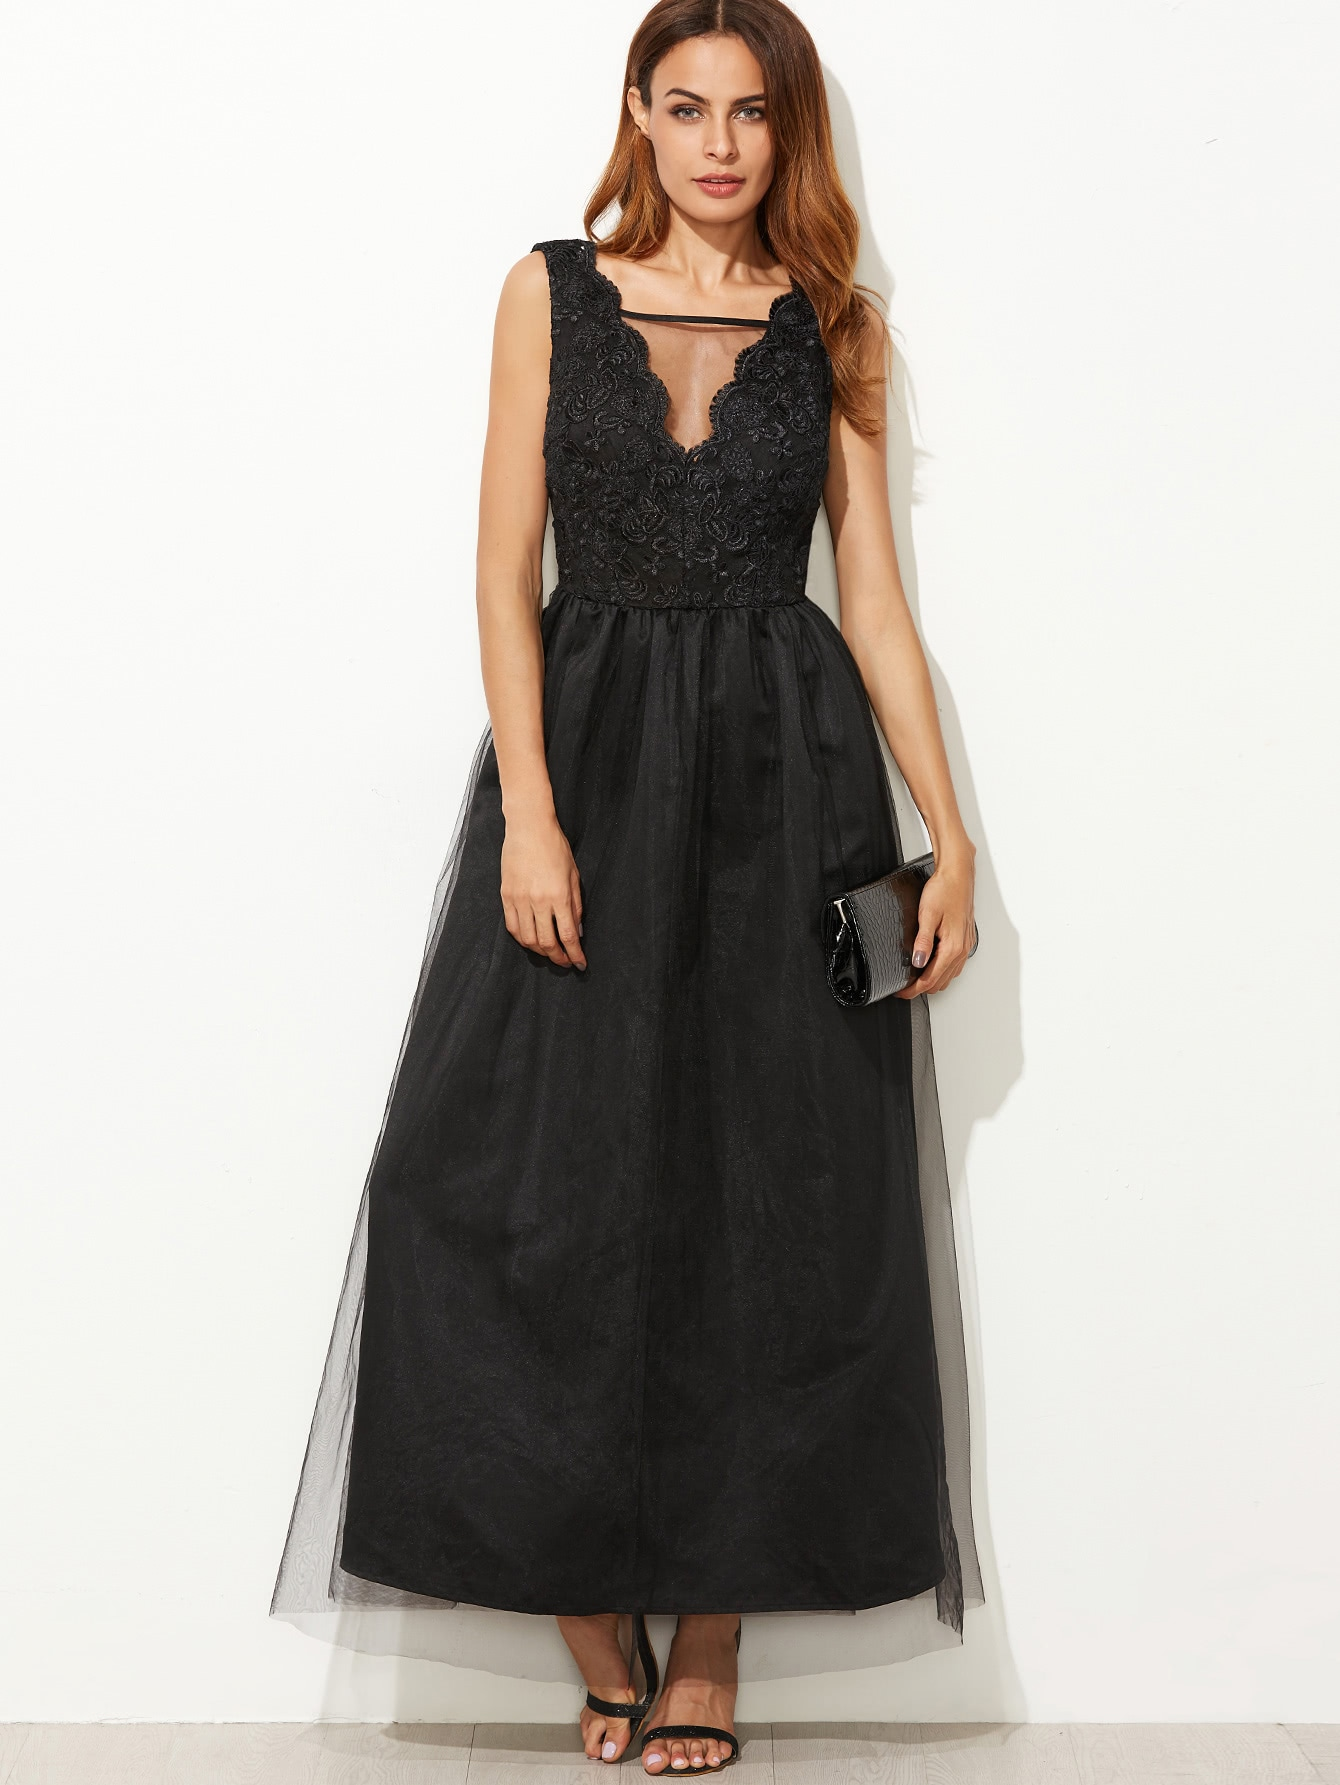 V Neckline Mesh Overlay Scallop Embroidered Dress scallop embroidered mesh overlay cami top